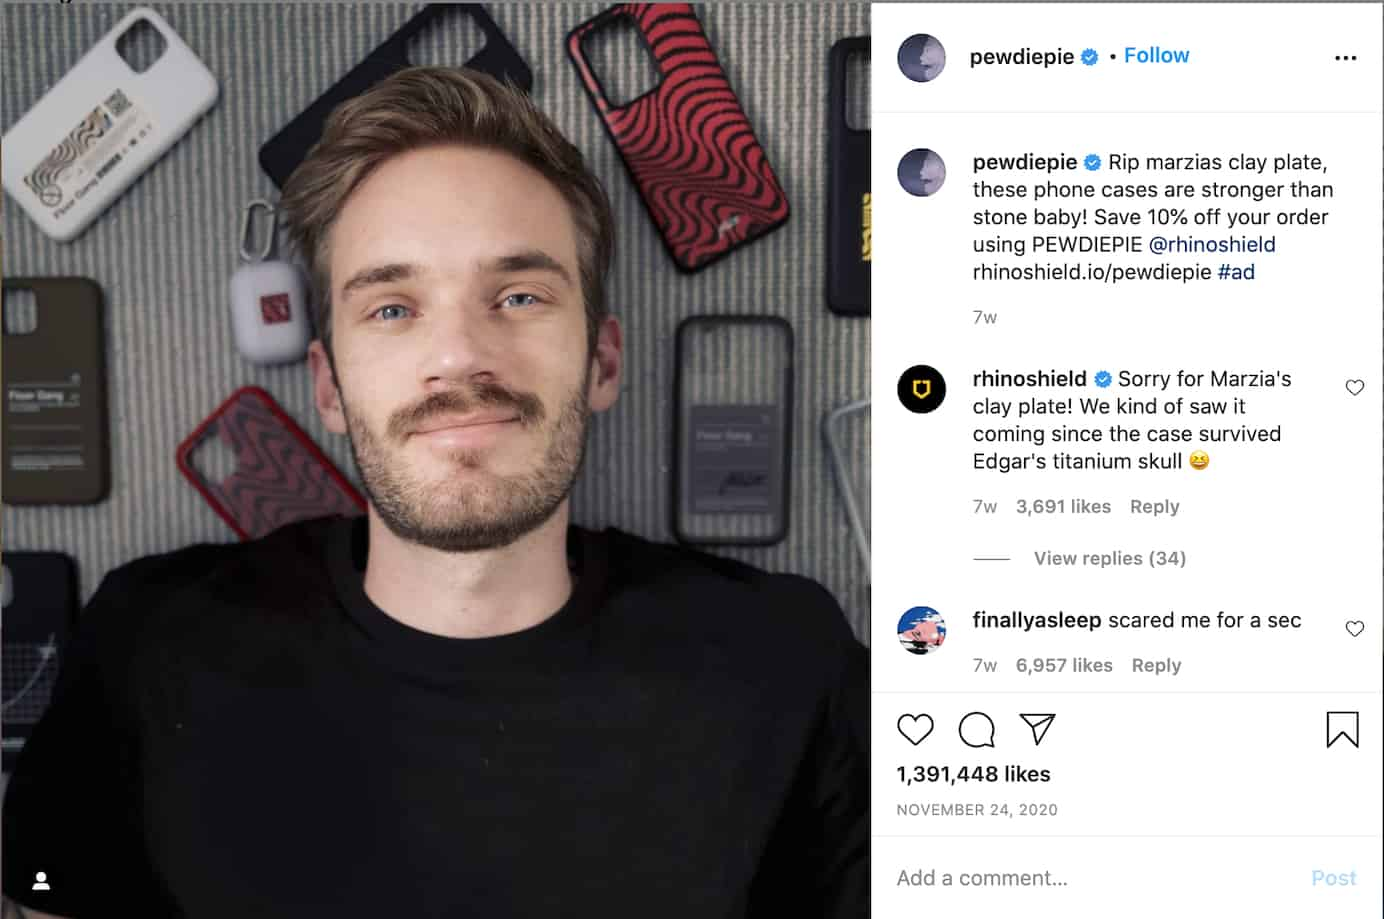 PewDiePie Instagram post